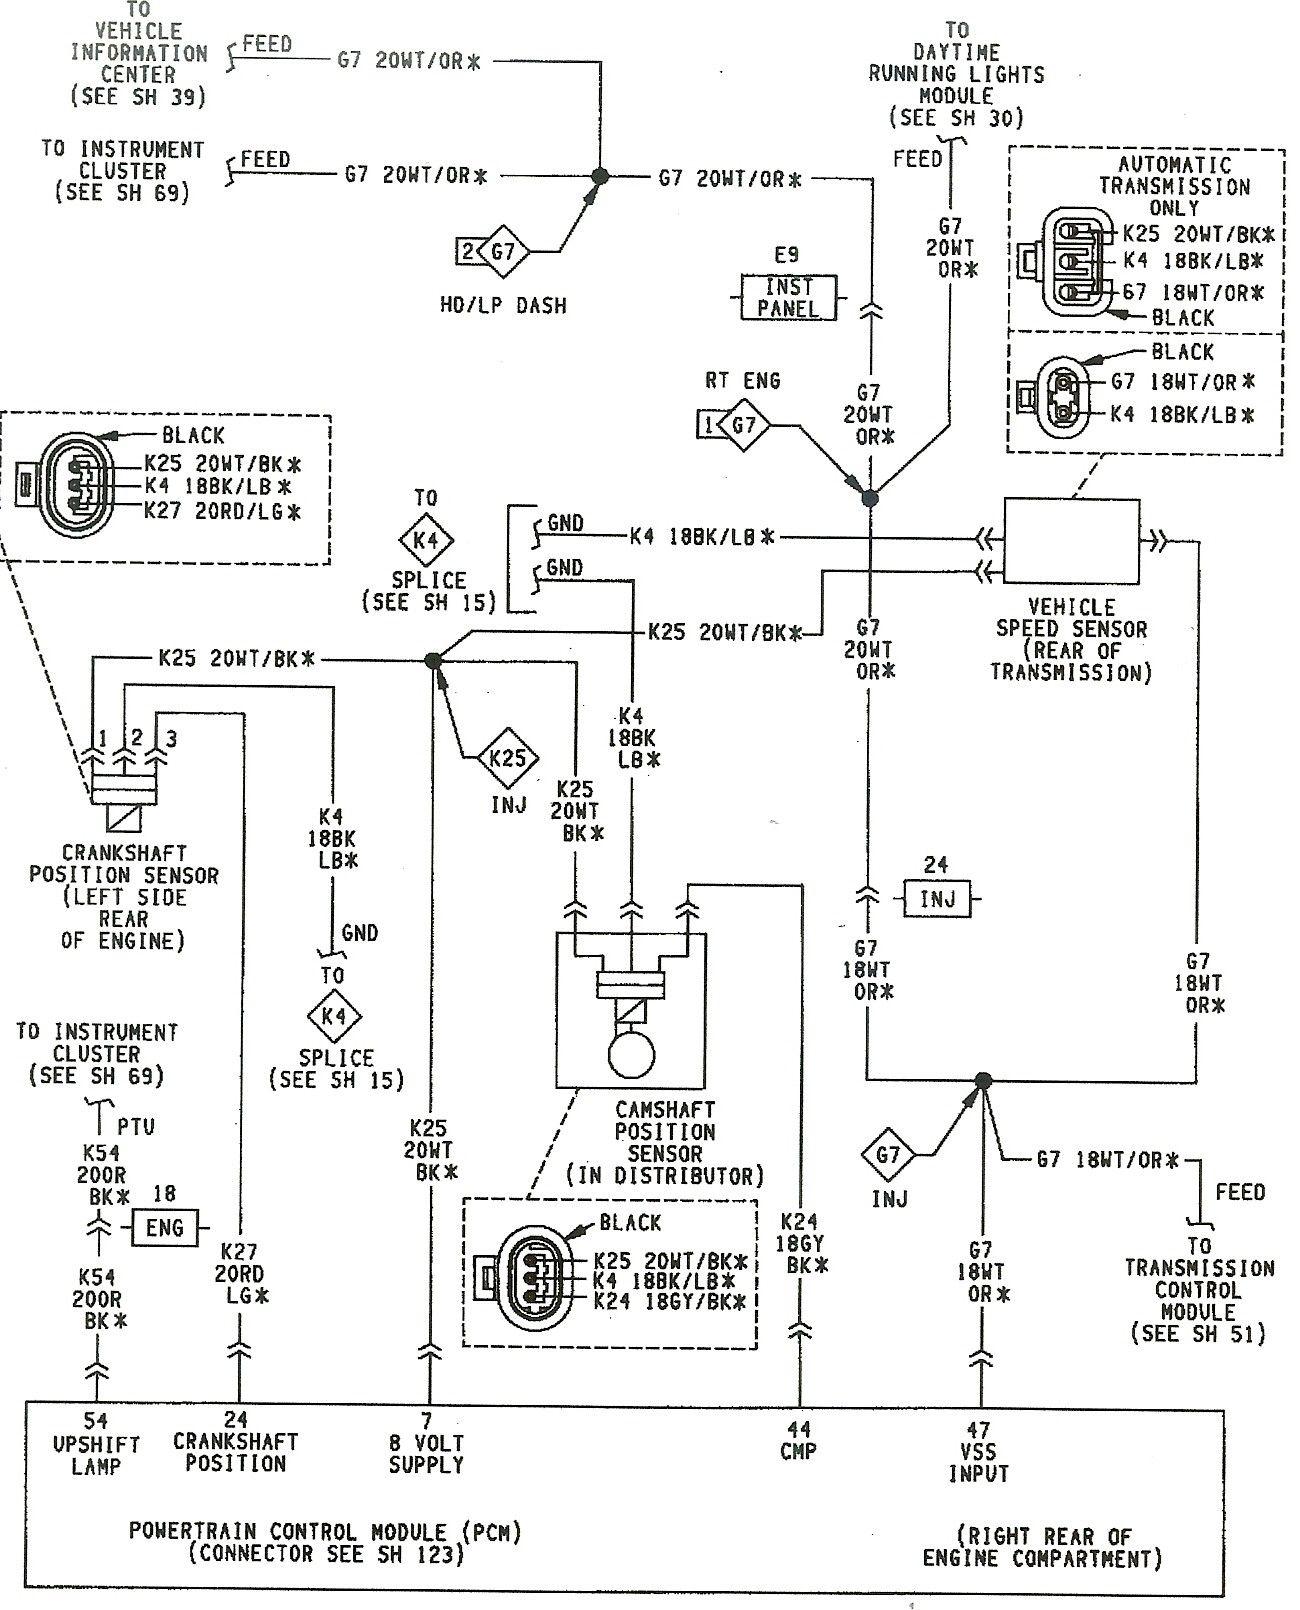 [DIAGRAM] 2000 Chevy K1500 Transfer Case Wiring Diagram